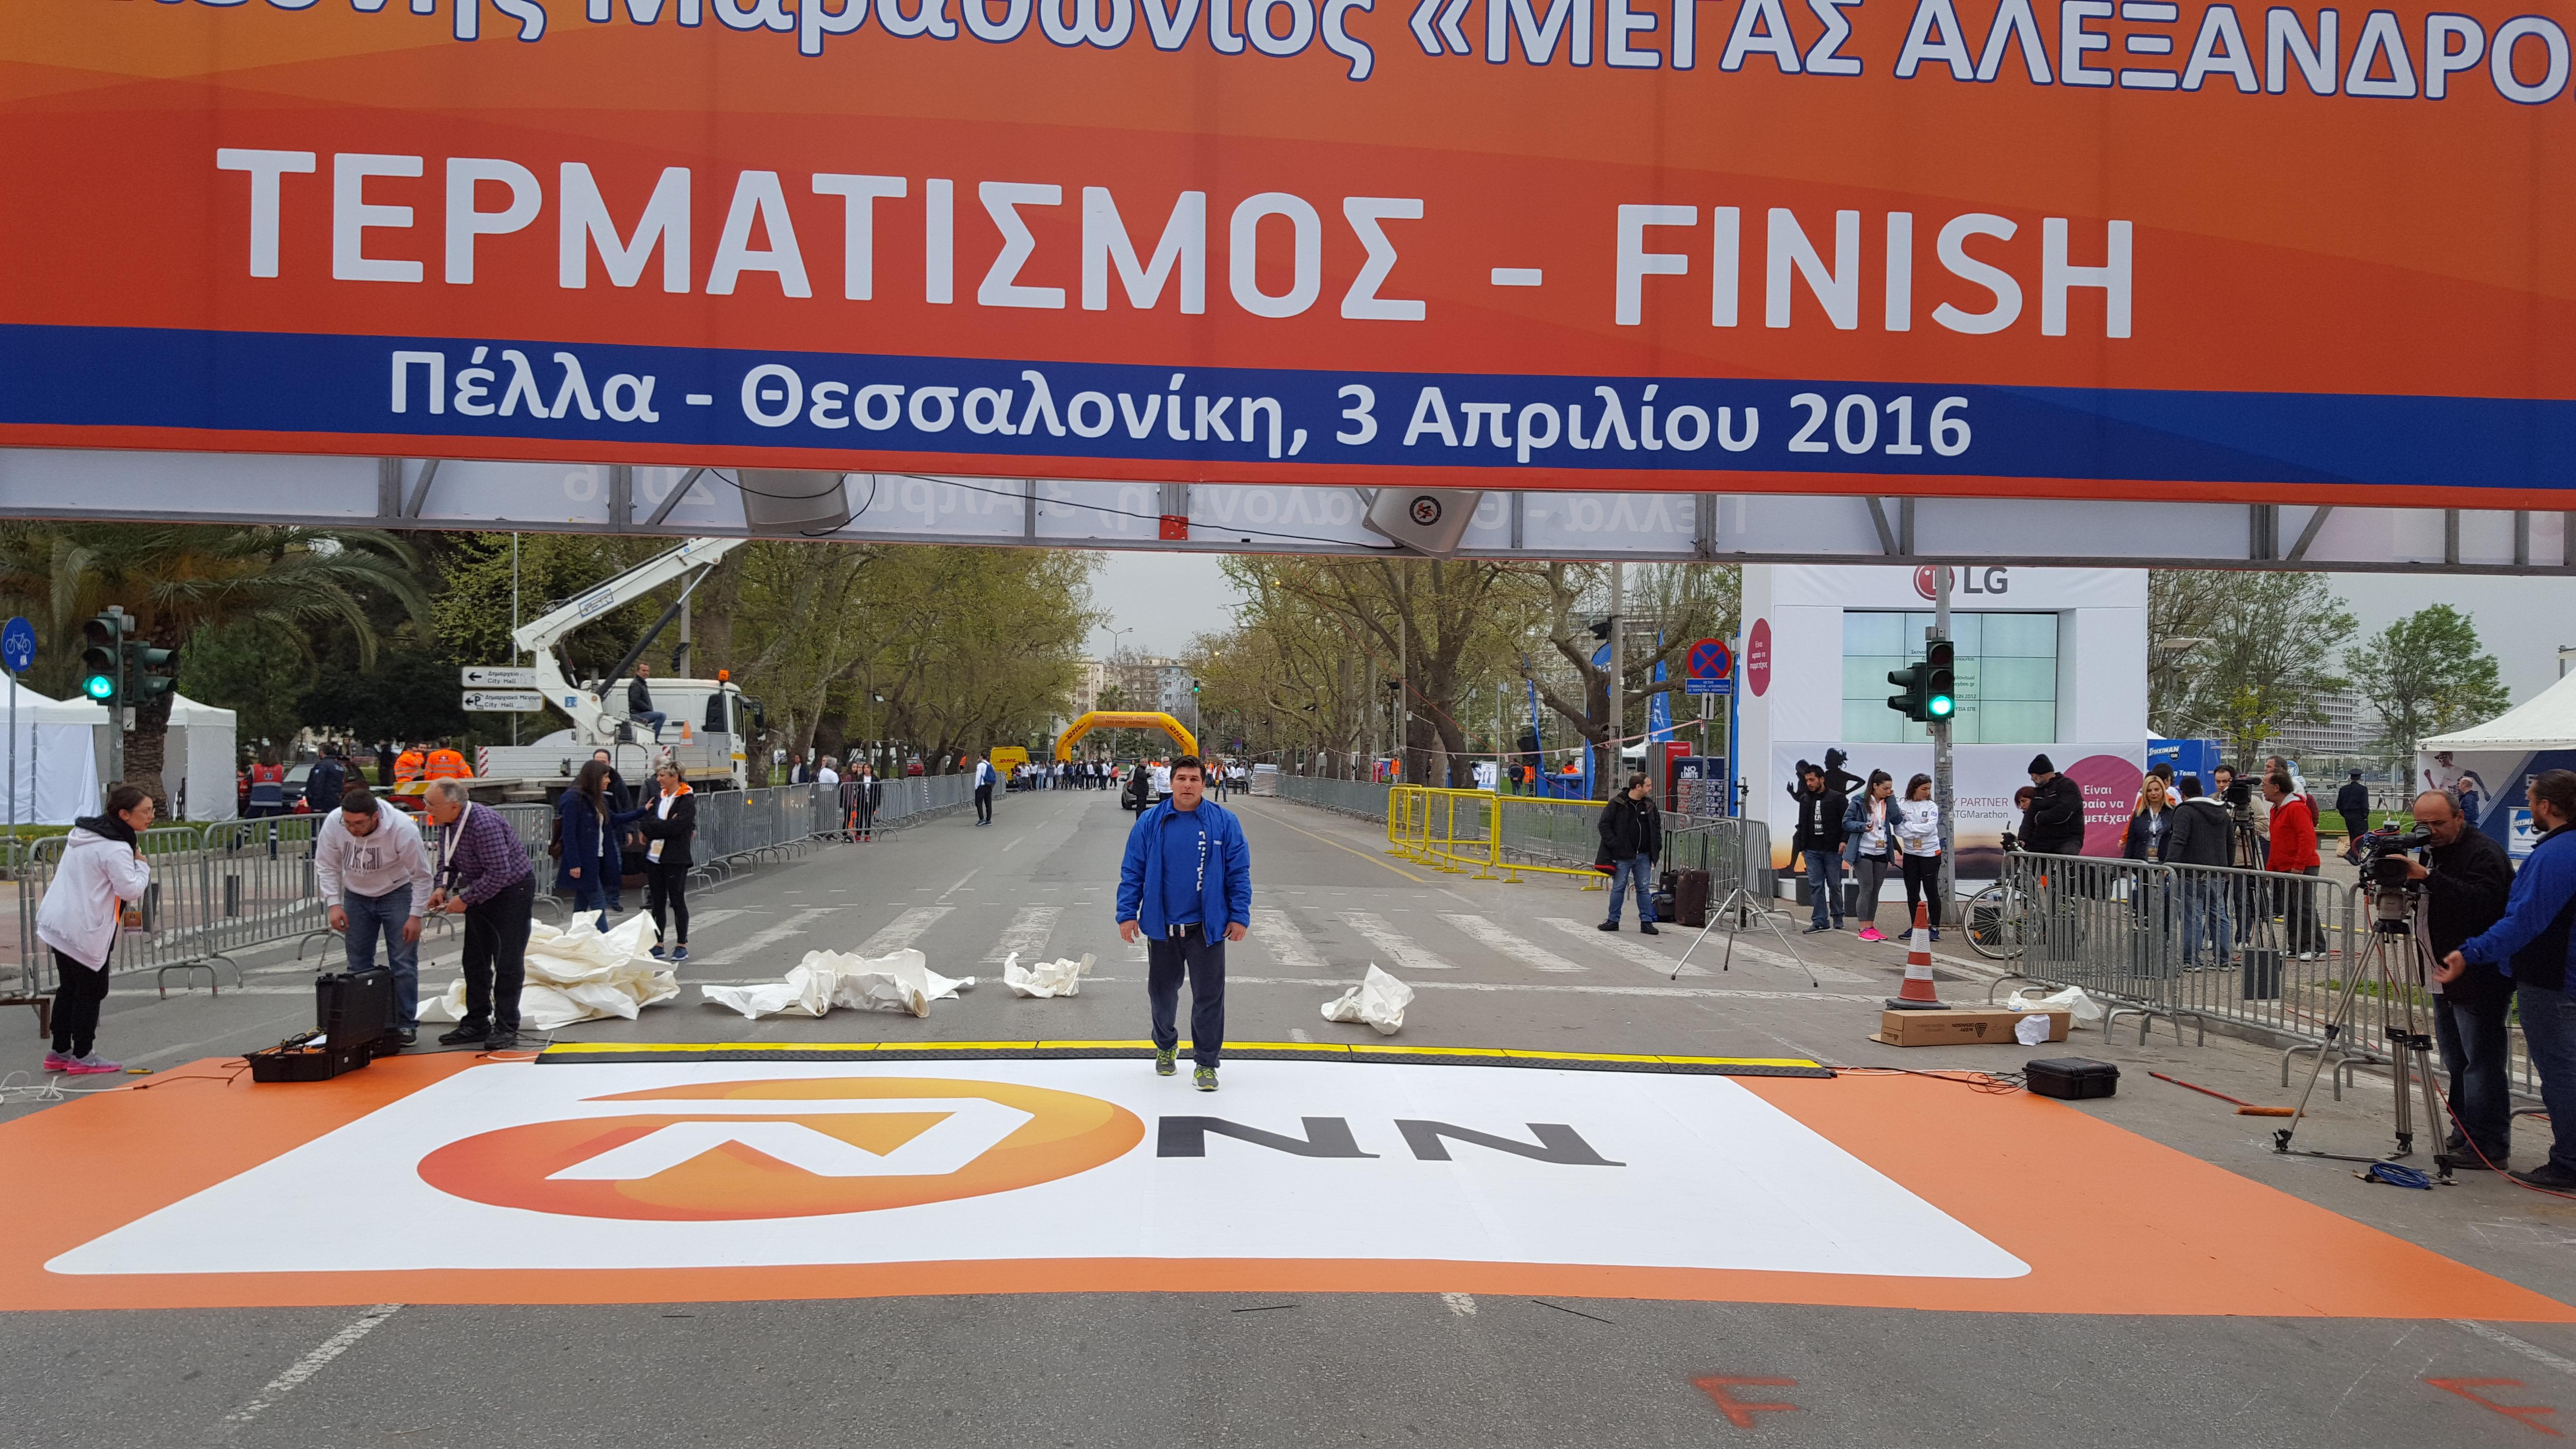 Mega Alexandros Marathon Thessal